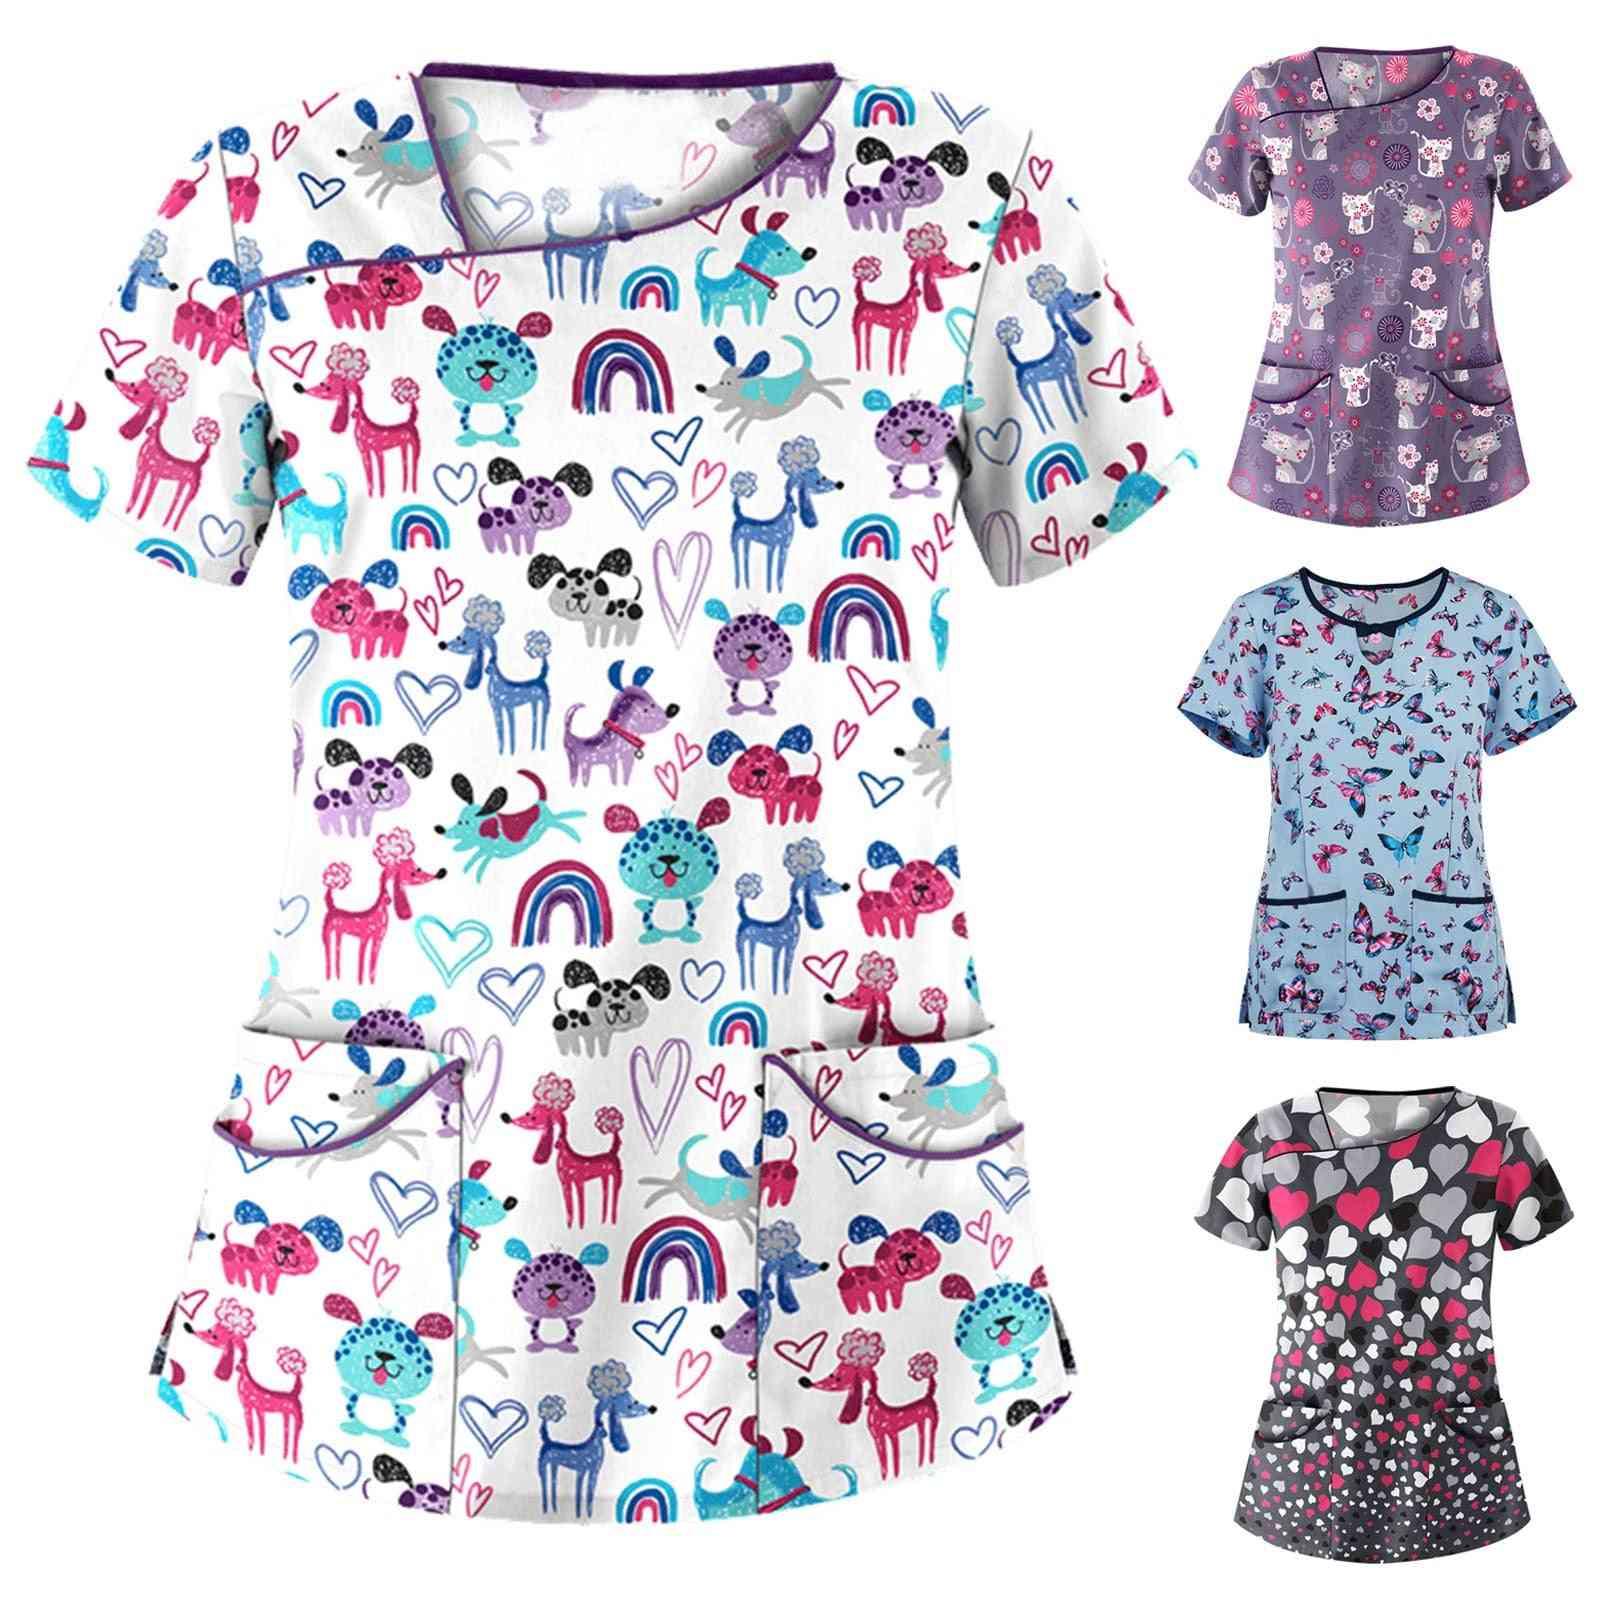 Women Short Sleeve Pocket V-neck Printing Tops Nurse Overalls Working Uniform